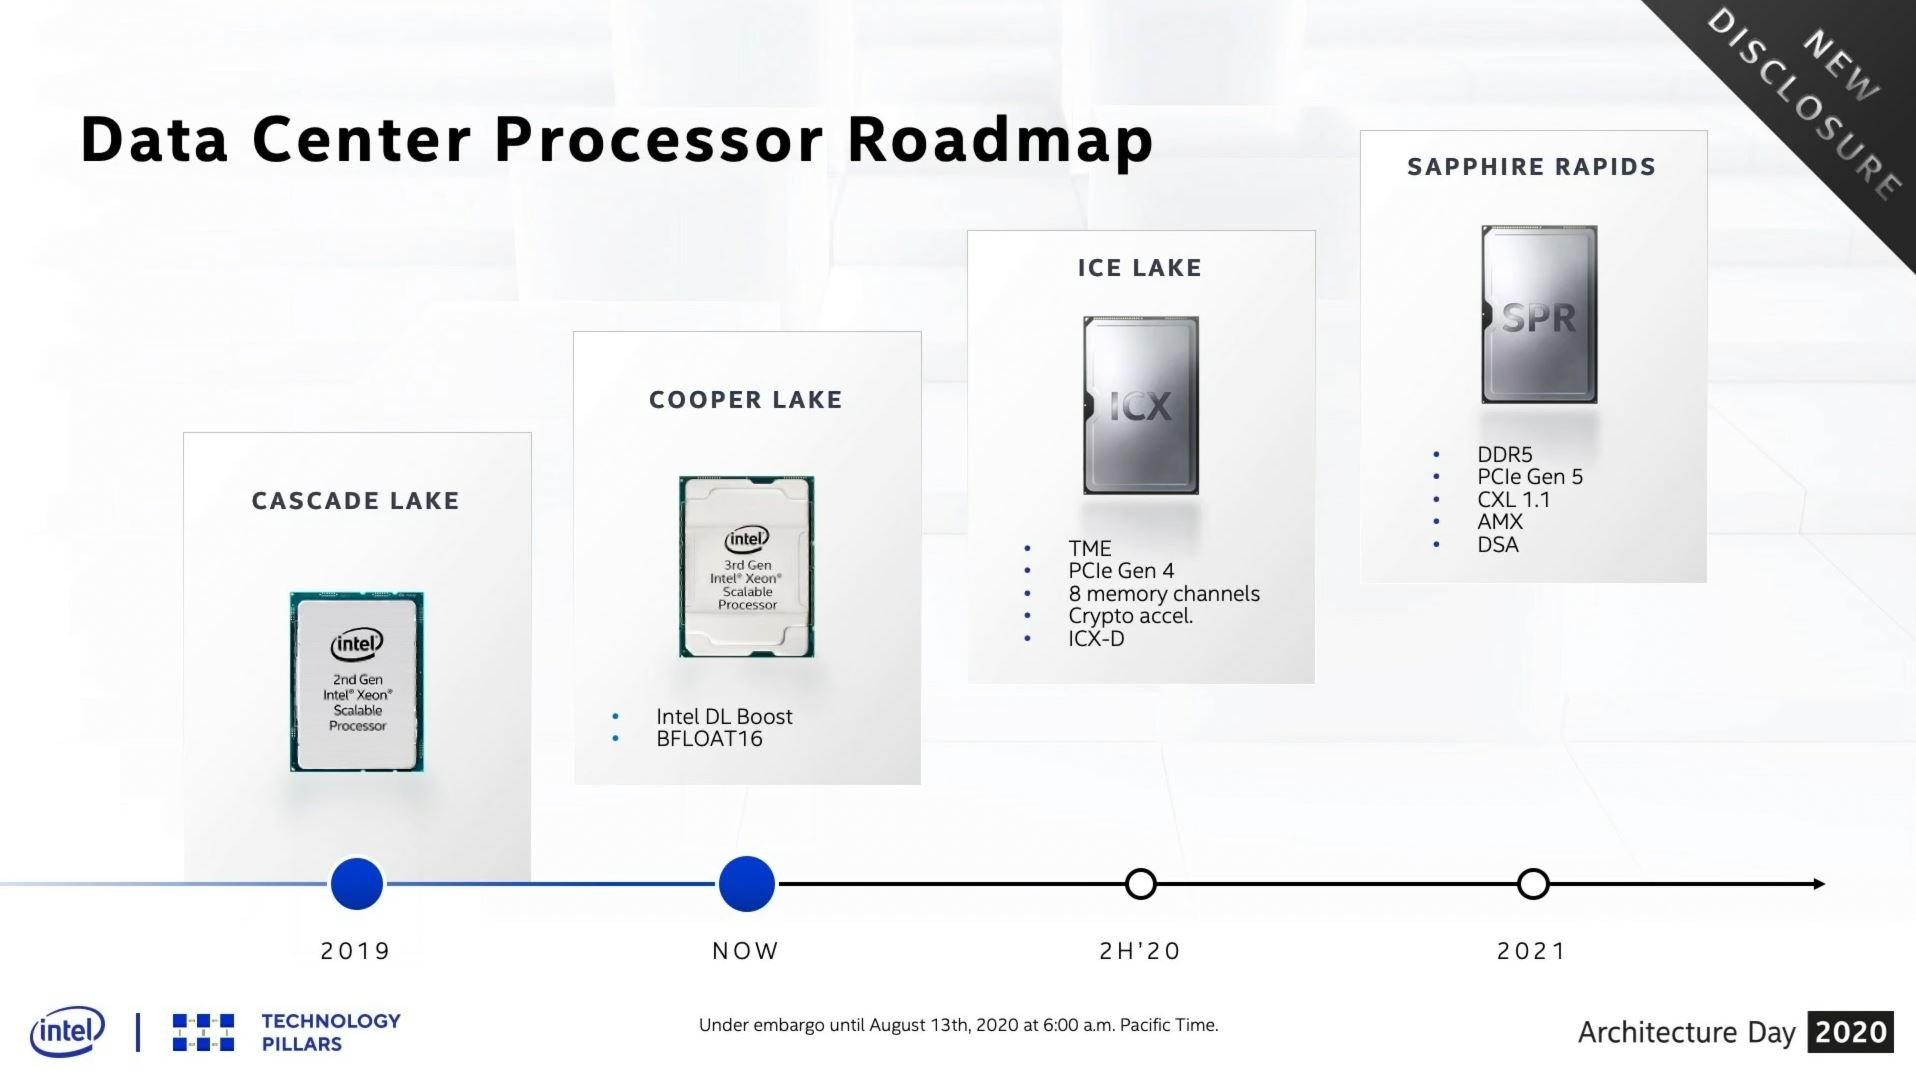 Intel Sapphire Rapids اینتل مشخصات پردازندههای زئون Ice Lake SP را اعلام کرد؛ ۲۸ هسته و لیتوگرافی +10nm اخبار IT